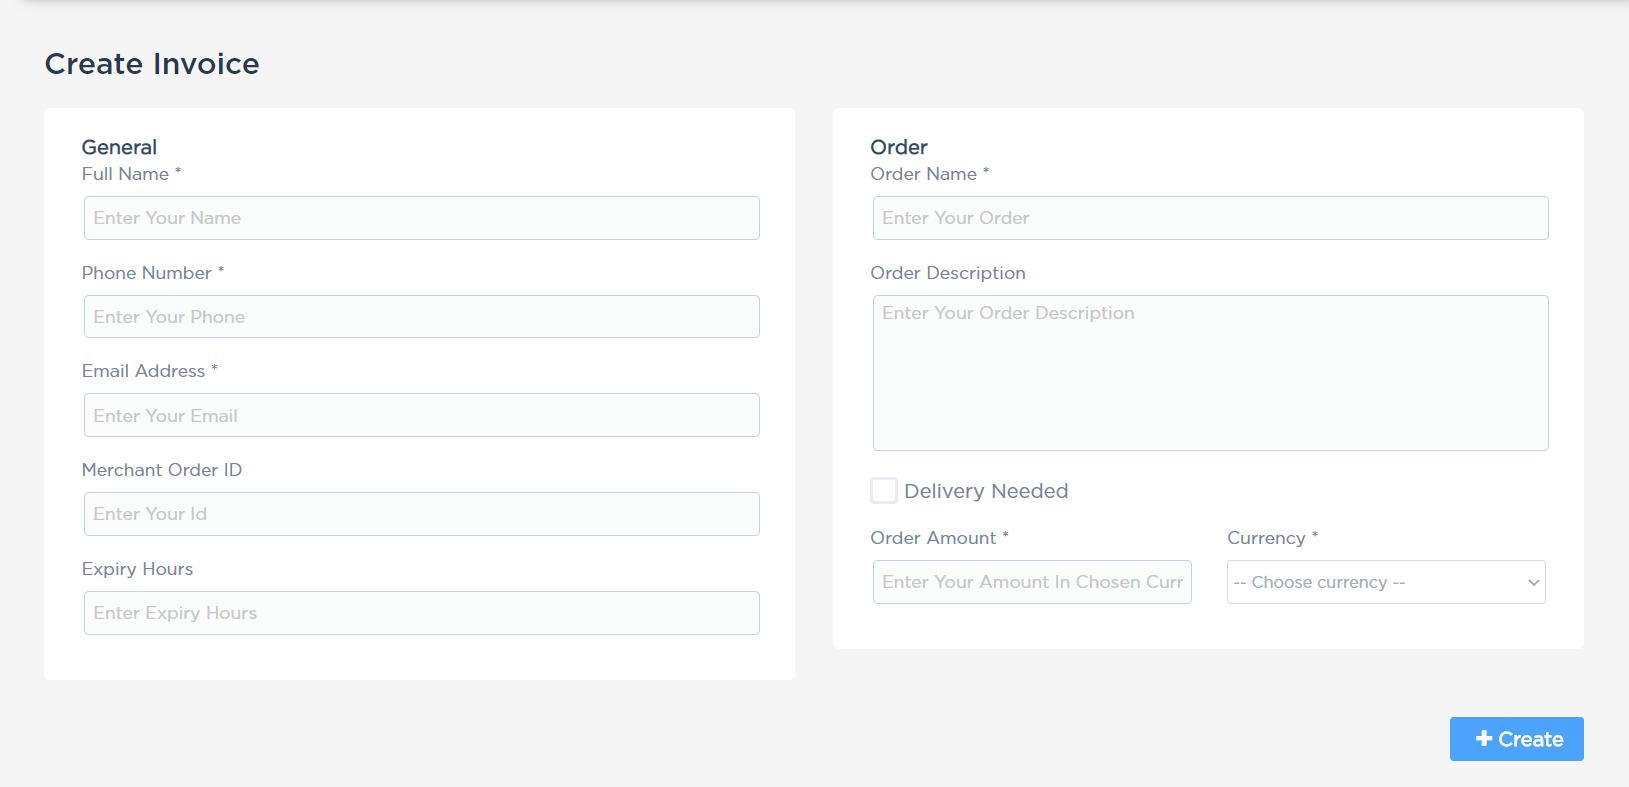 Accept dashboard - Invoice Creation.